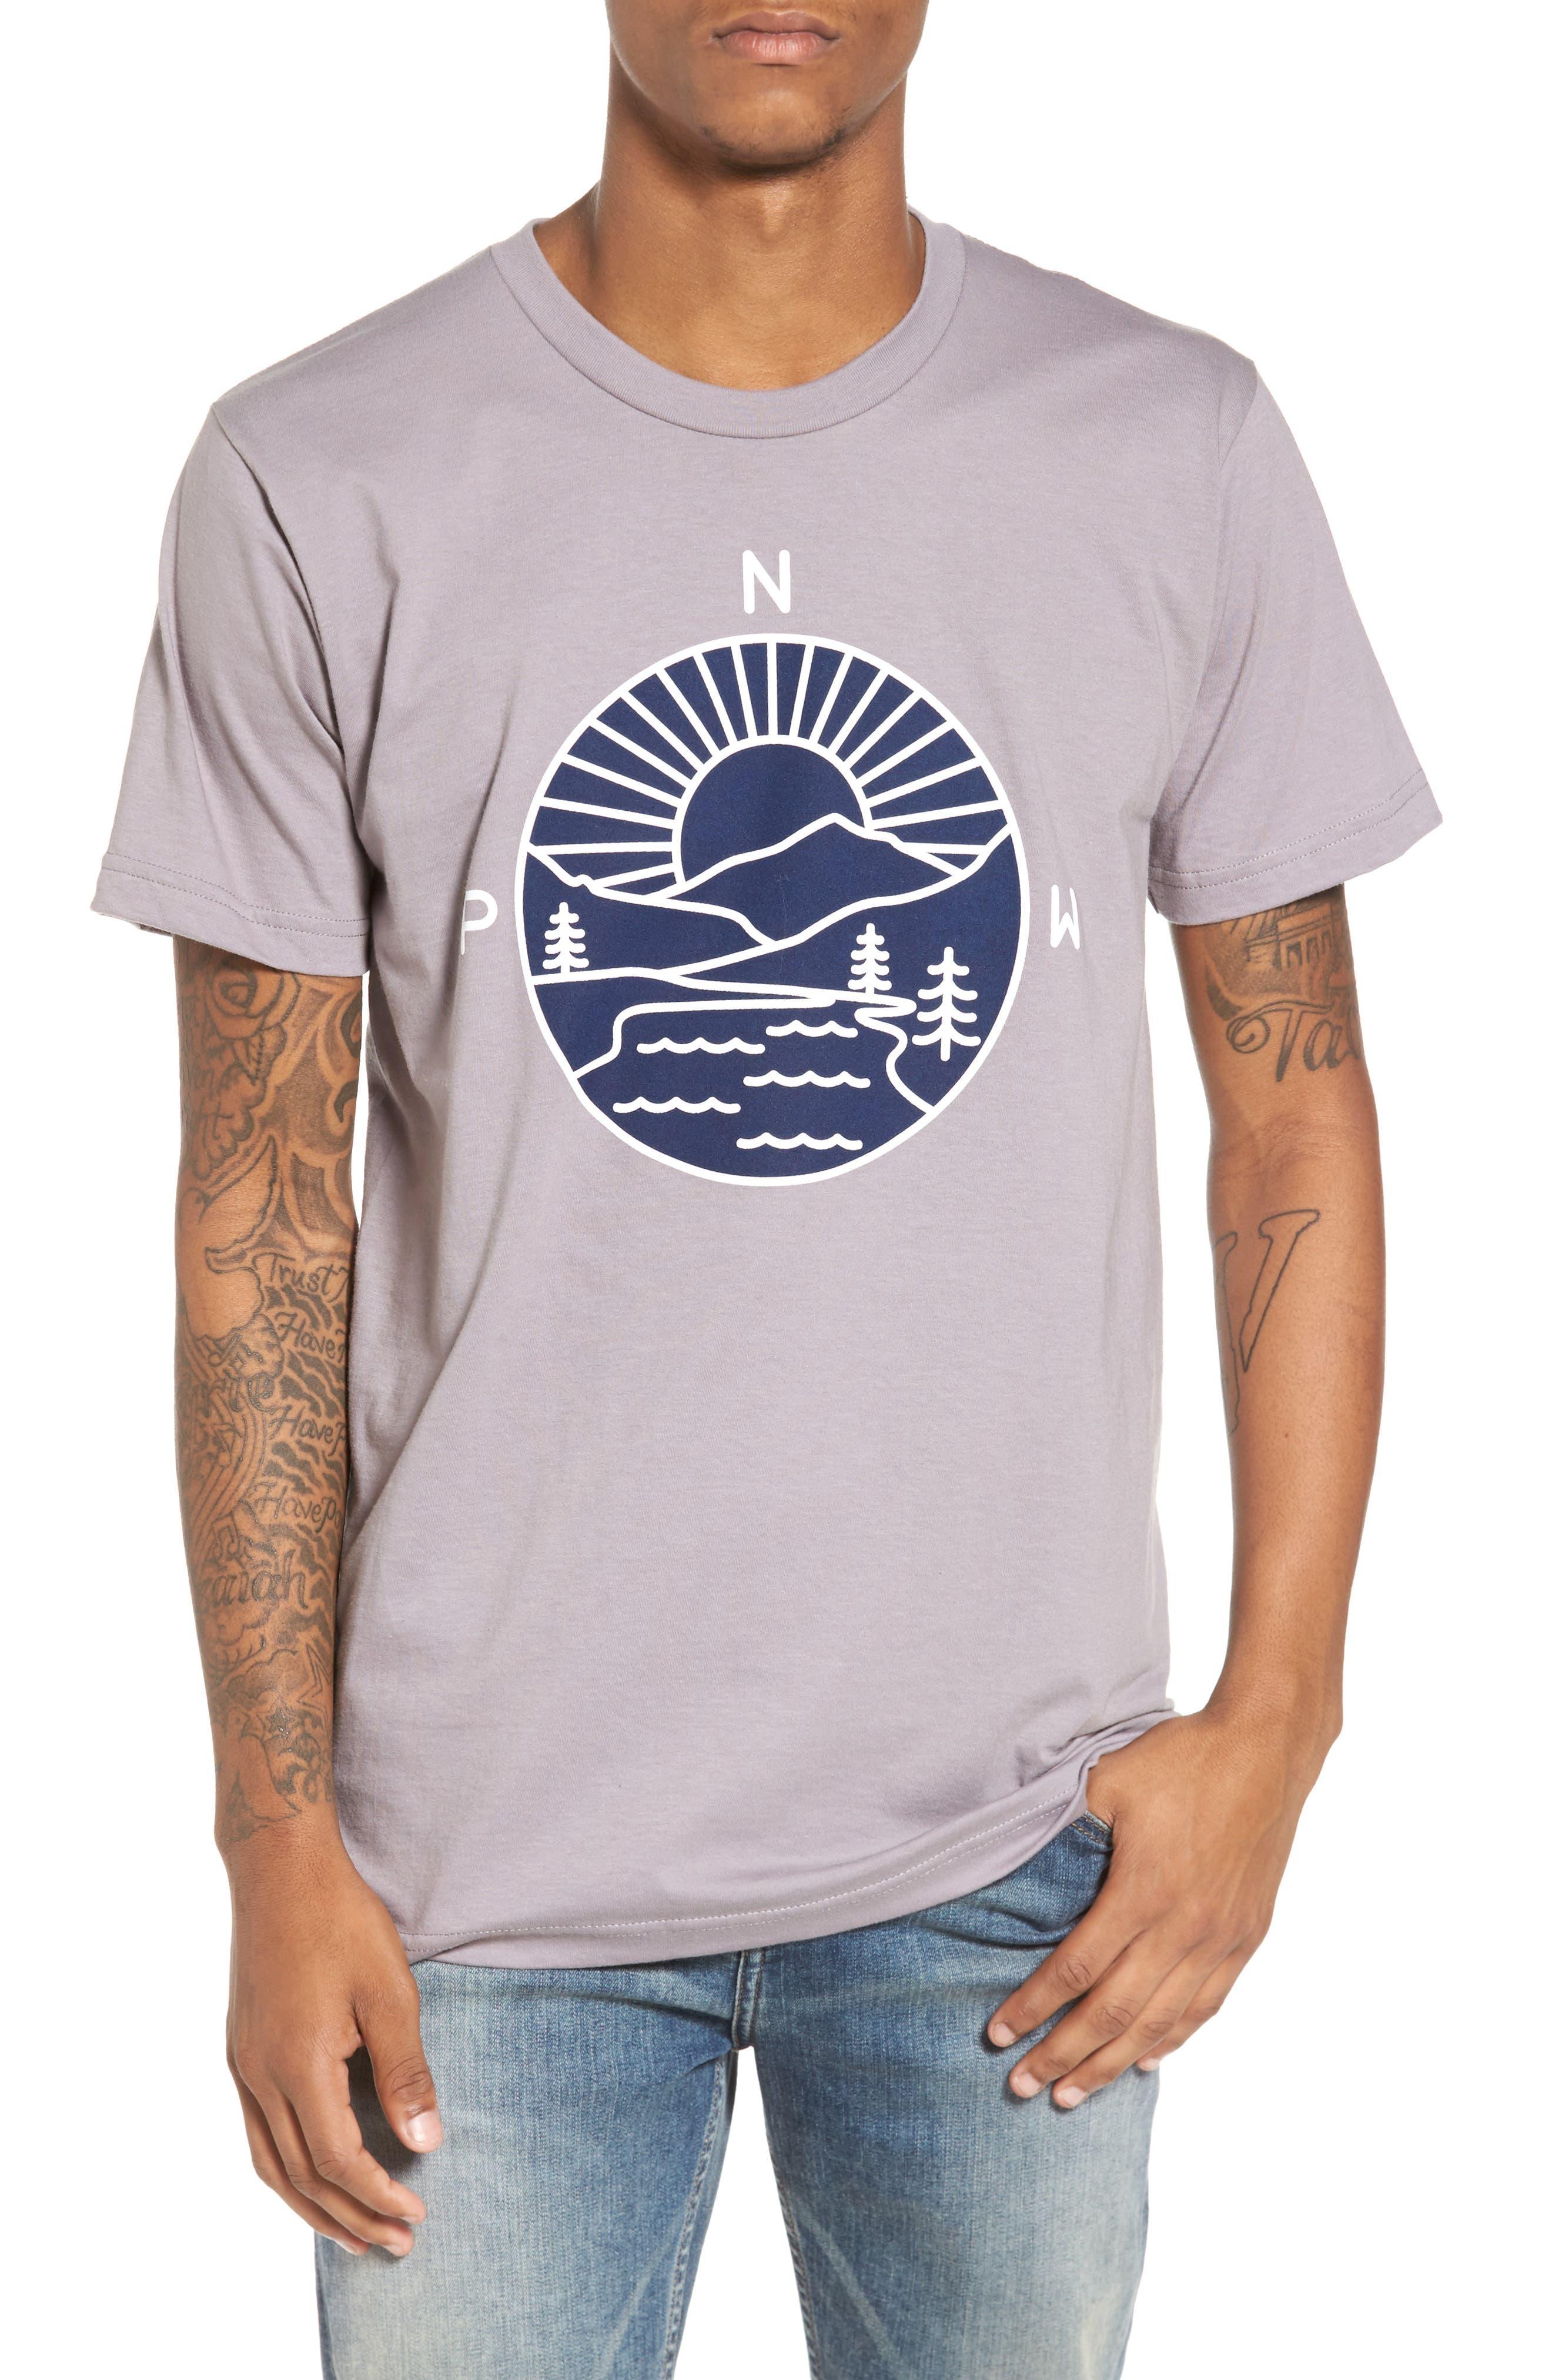 Main Image - Casual Industrees PNW Explorer T-Shirt